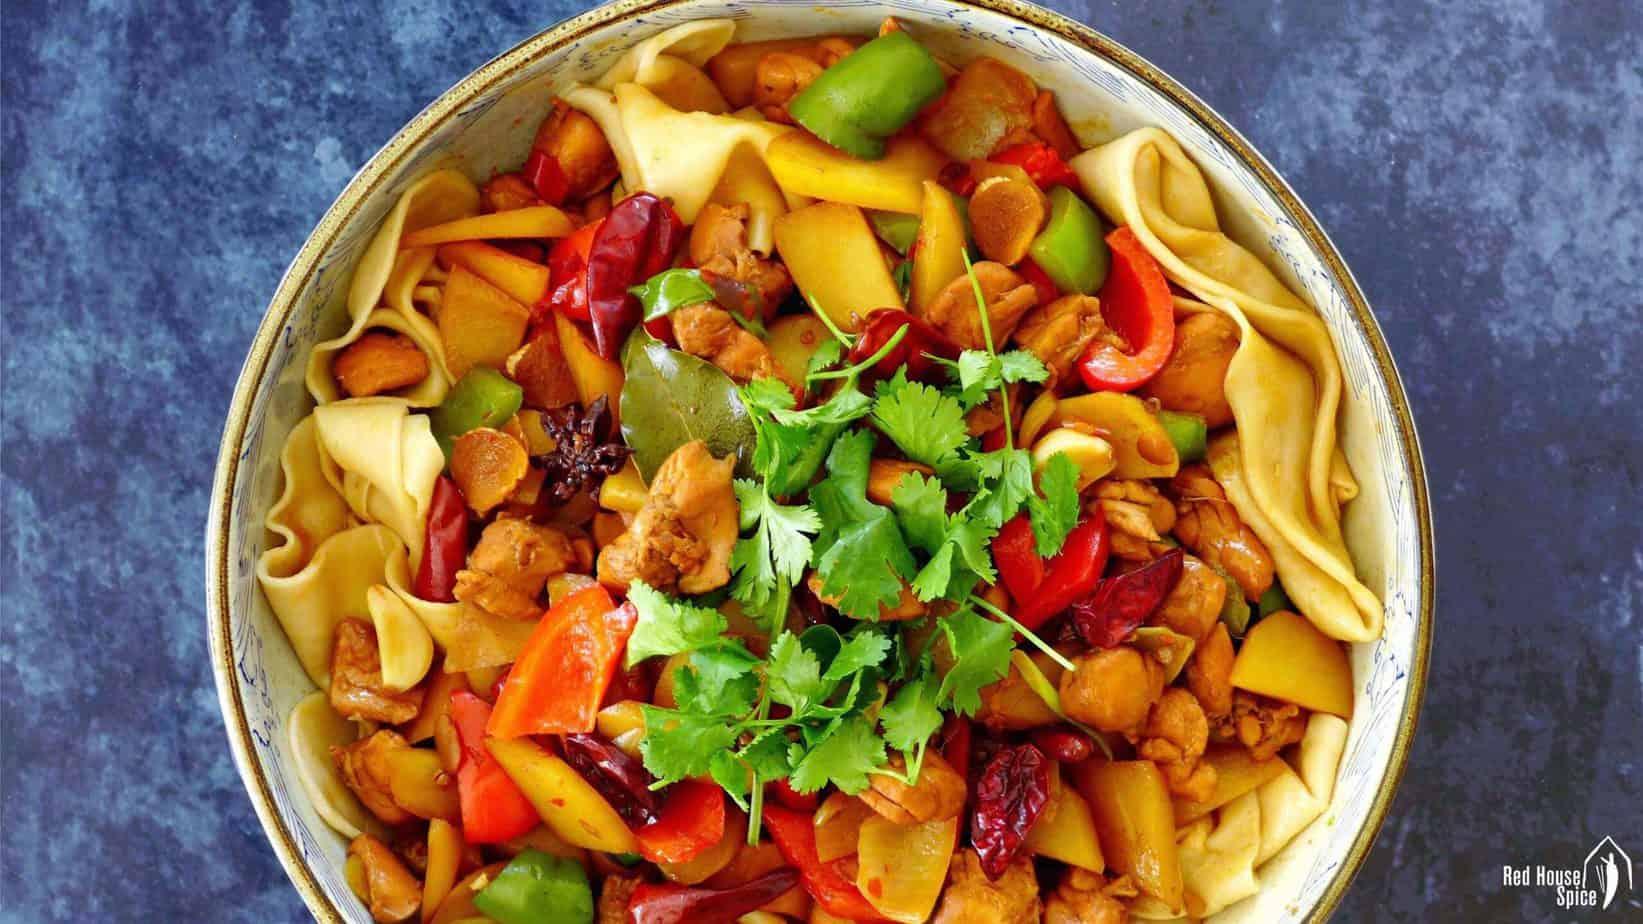 Dan Pan Ji chicken stew served on top of hand-pulled noodles.